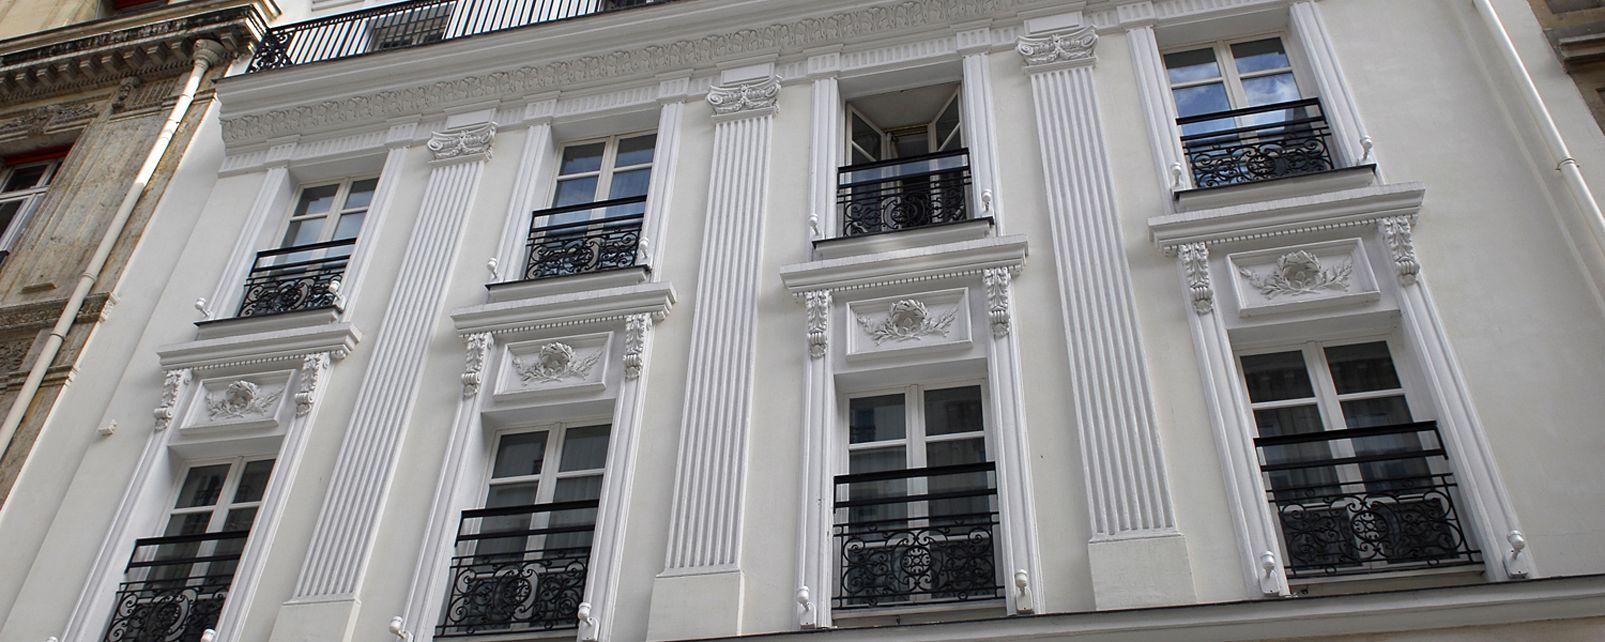 Hotel du Romancier